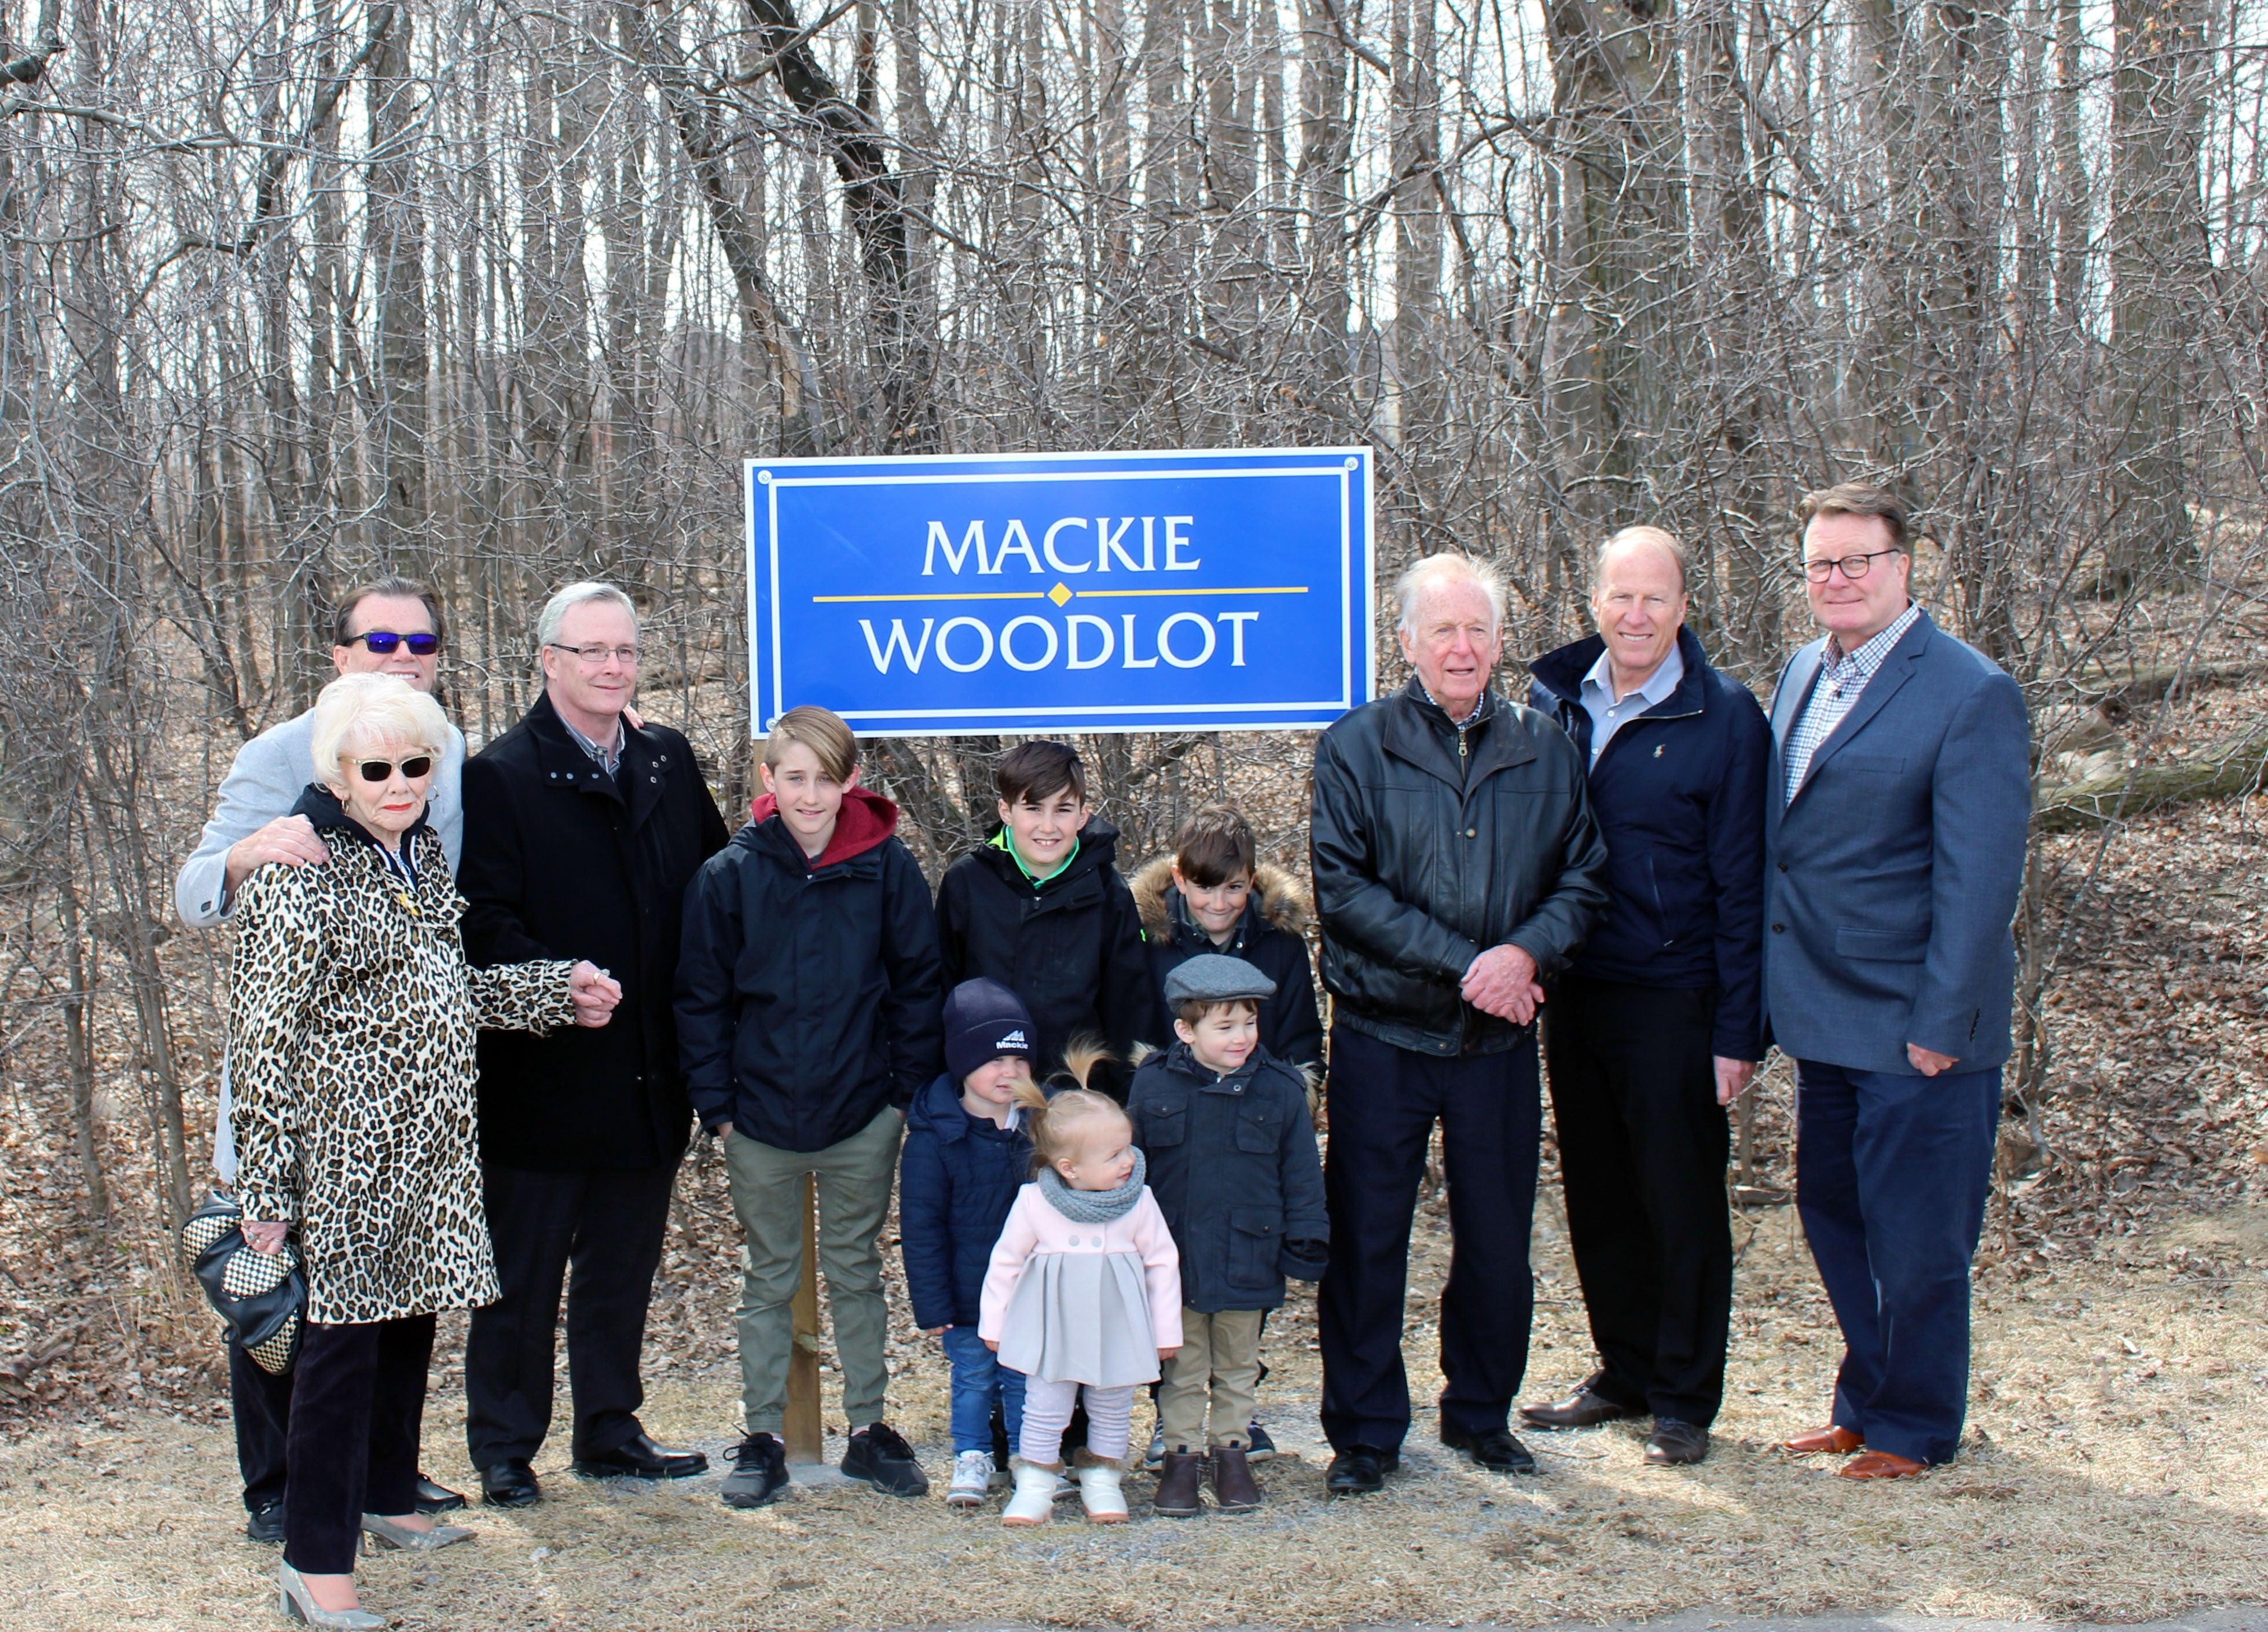 City of Oshawa Honours the Mackie Family at a Park and Woodlot Naming Ceremony